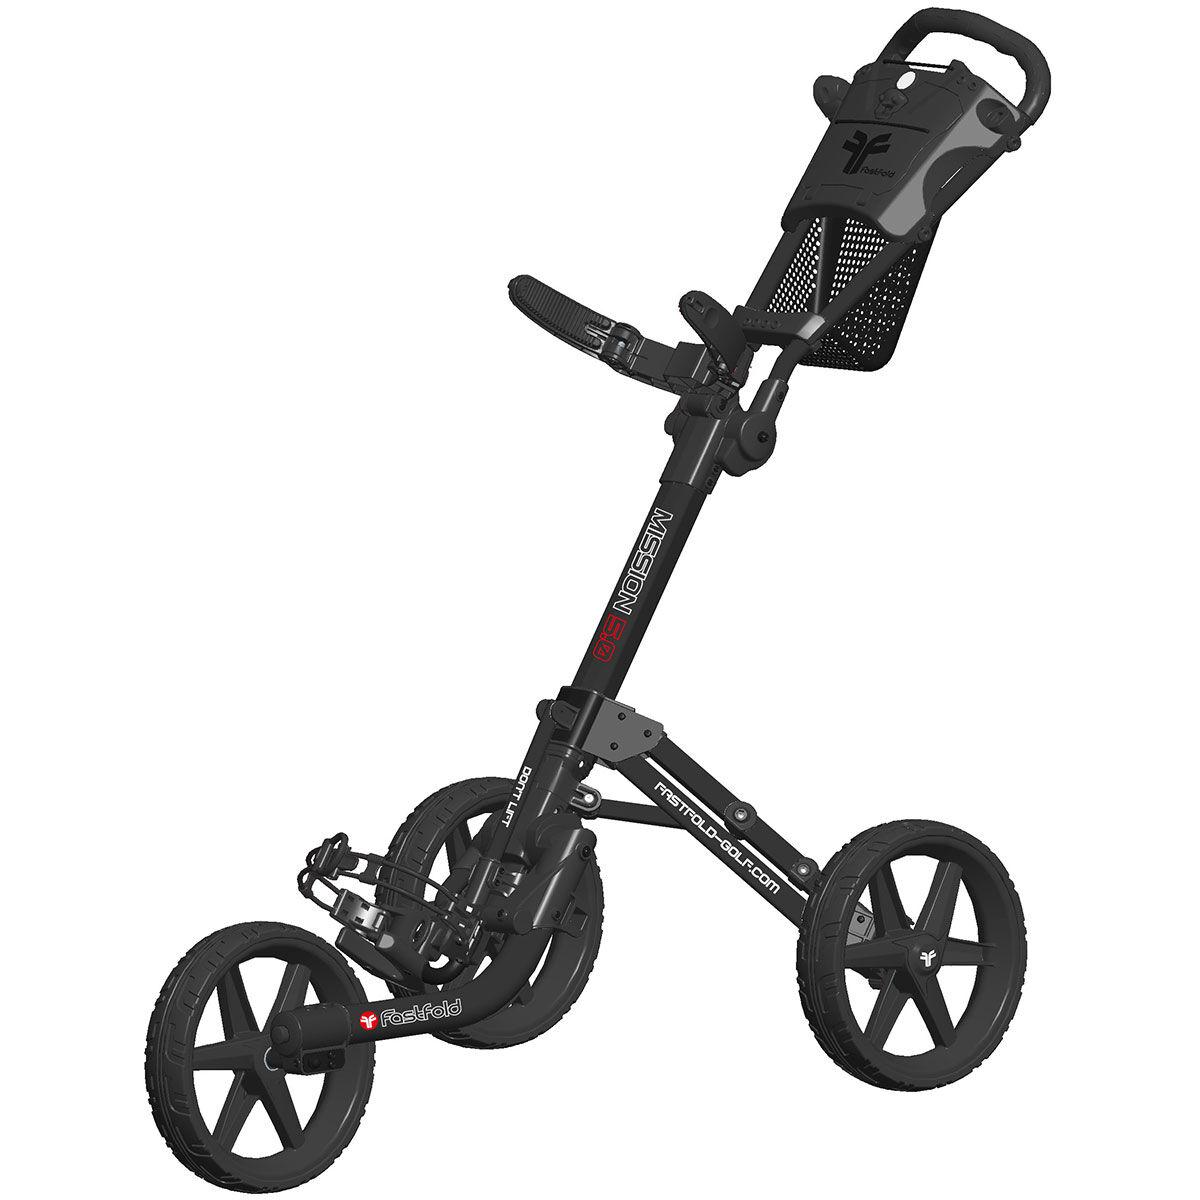 Fast Fold Fastfold Mission 5.0 3 Wheel Push Golf Trolley, Charcoal/black, One Size | American Golf